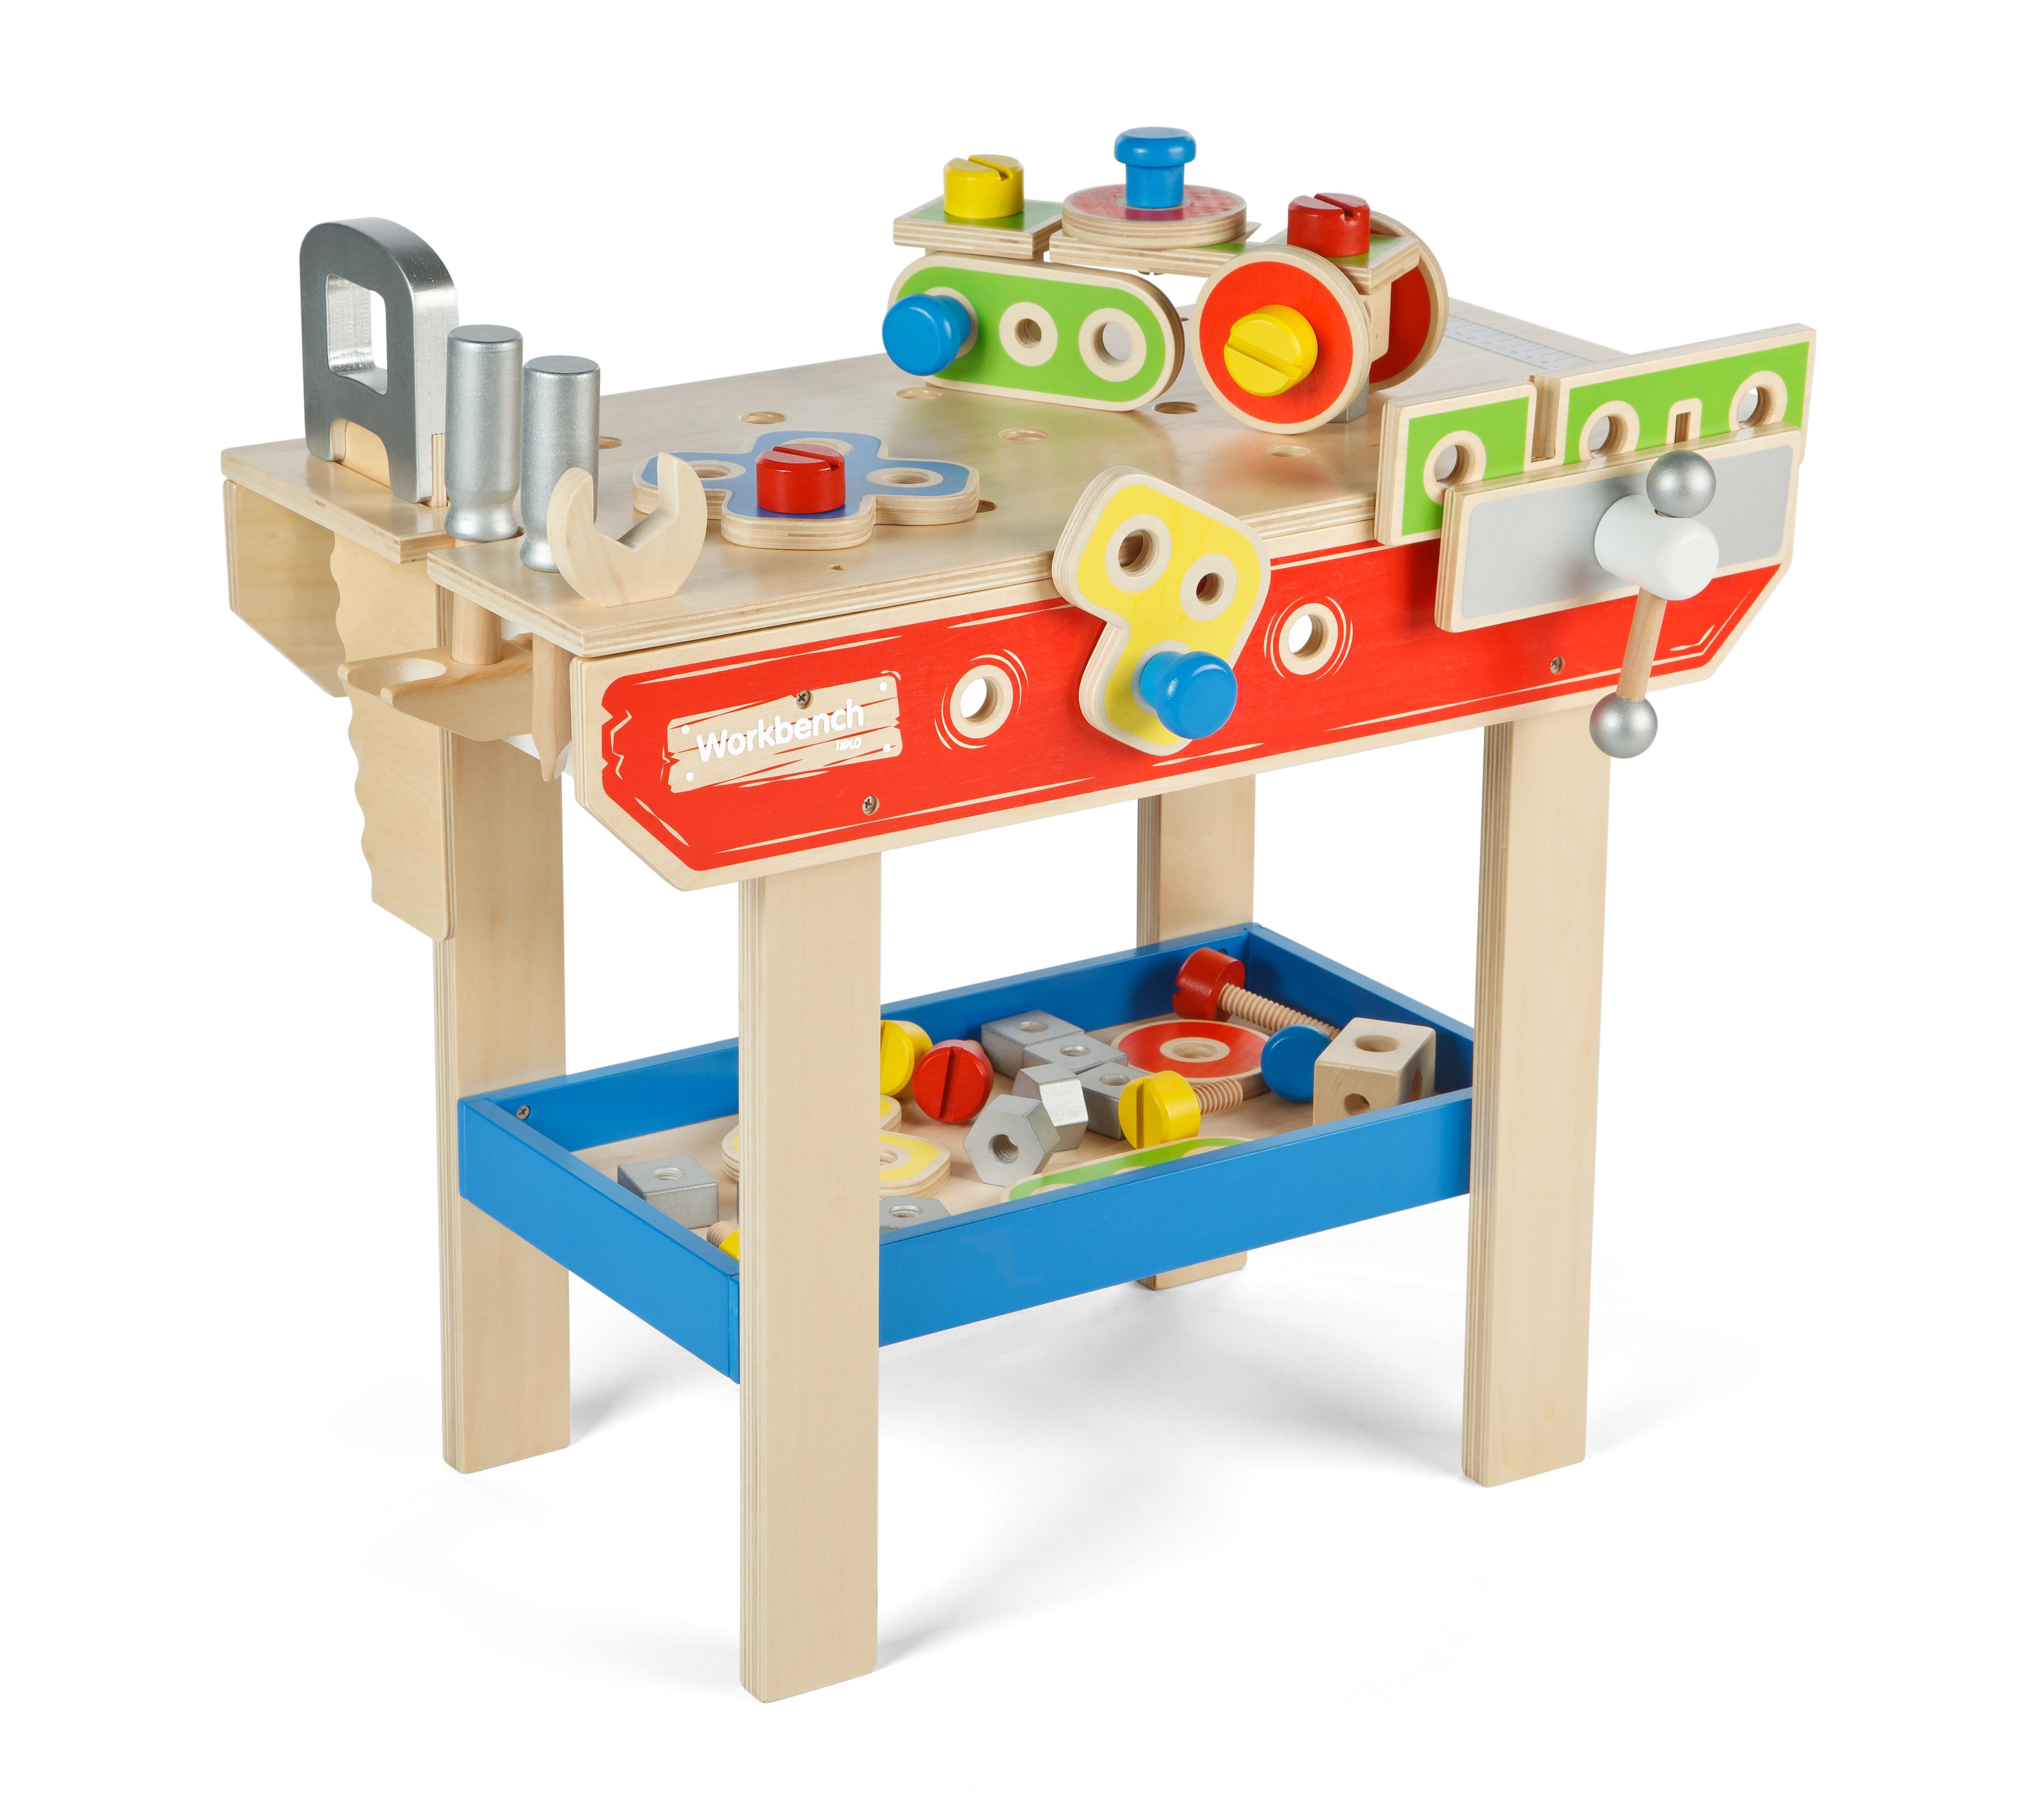 Wooden Workbench for children & kids in S A